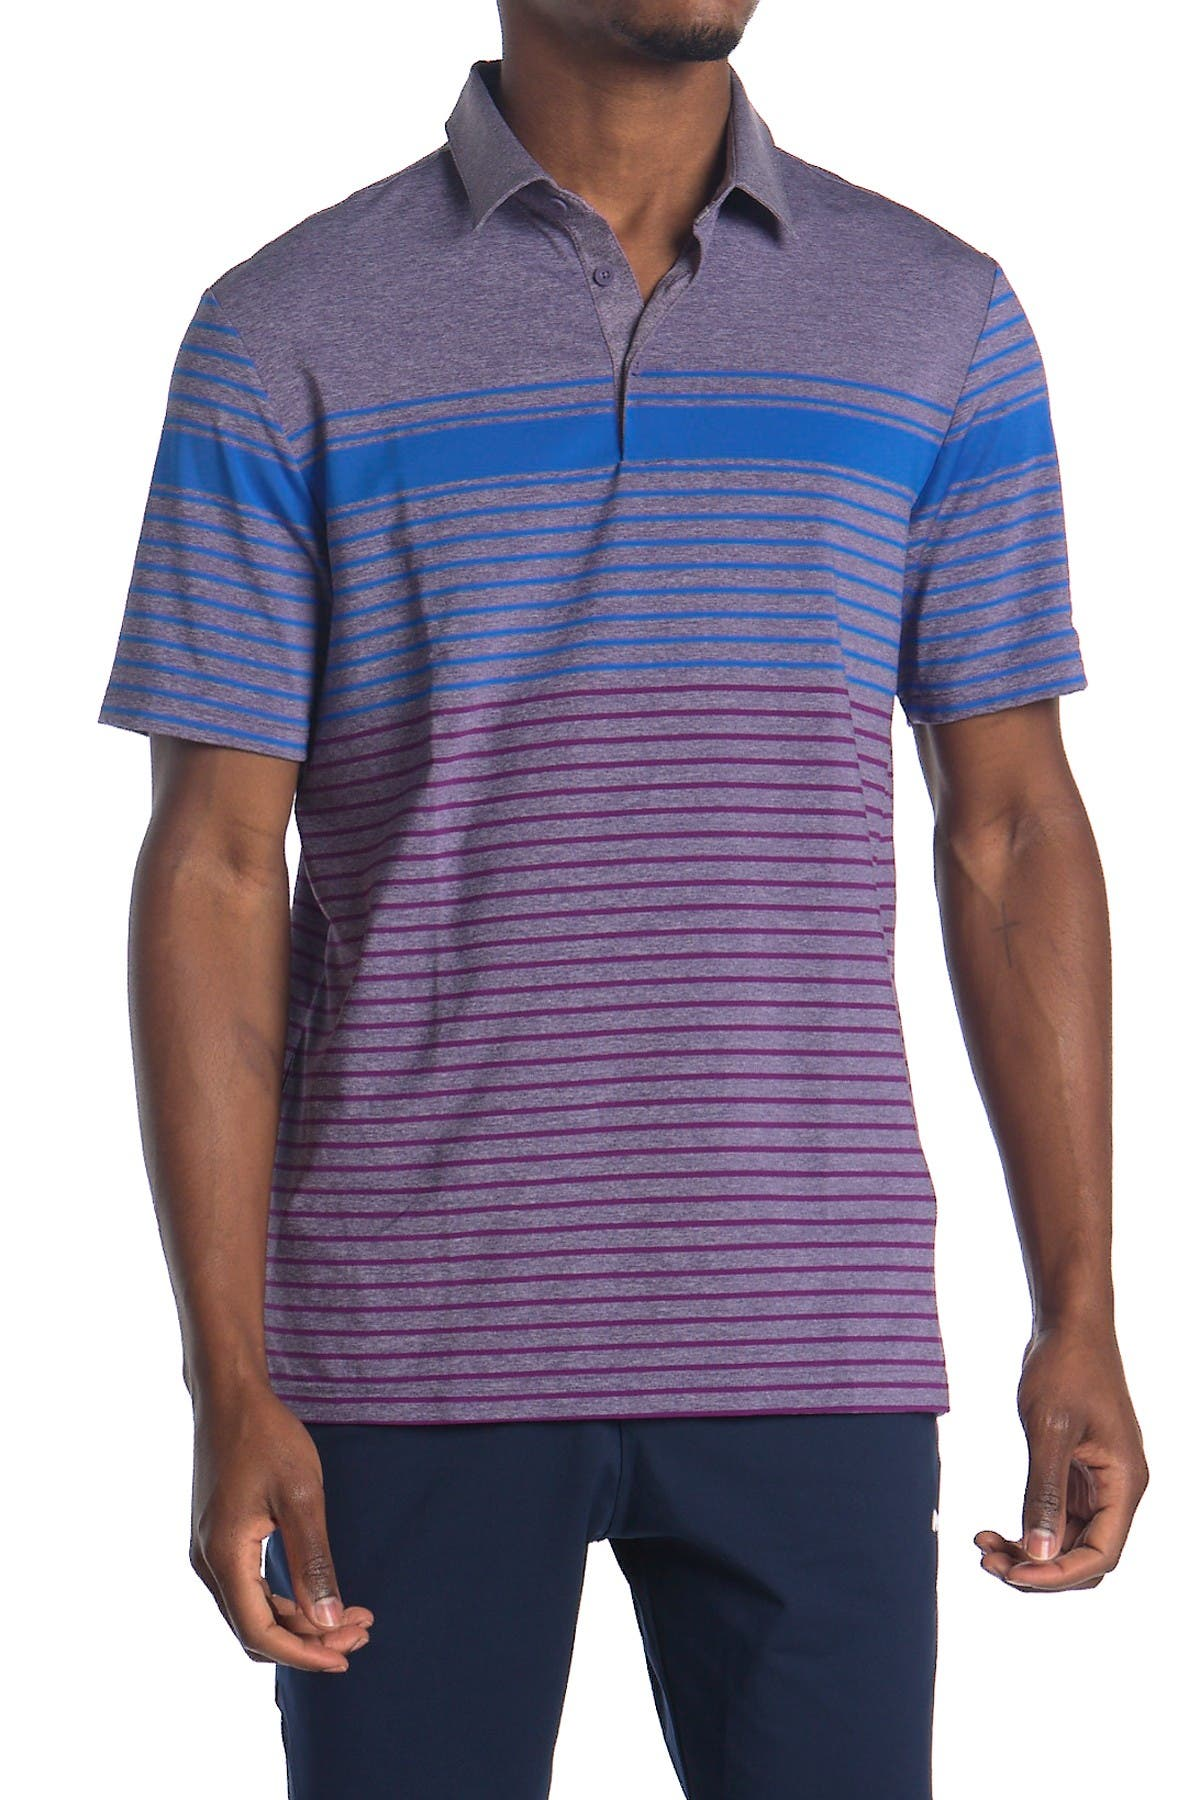 Image of adidas Ultimate 365 Golf Polo